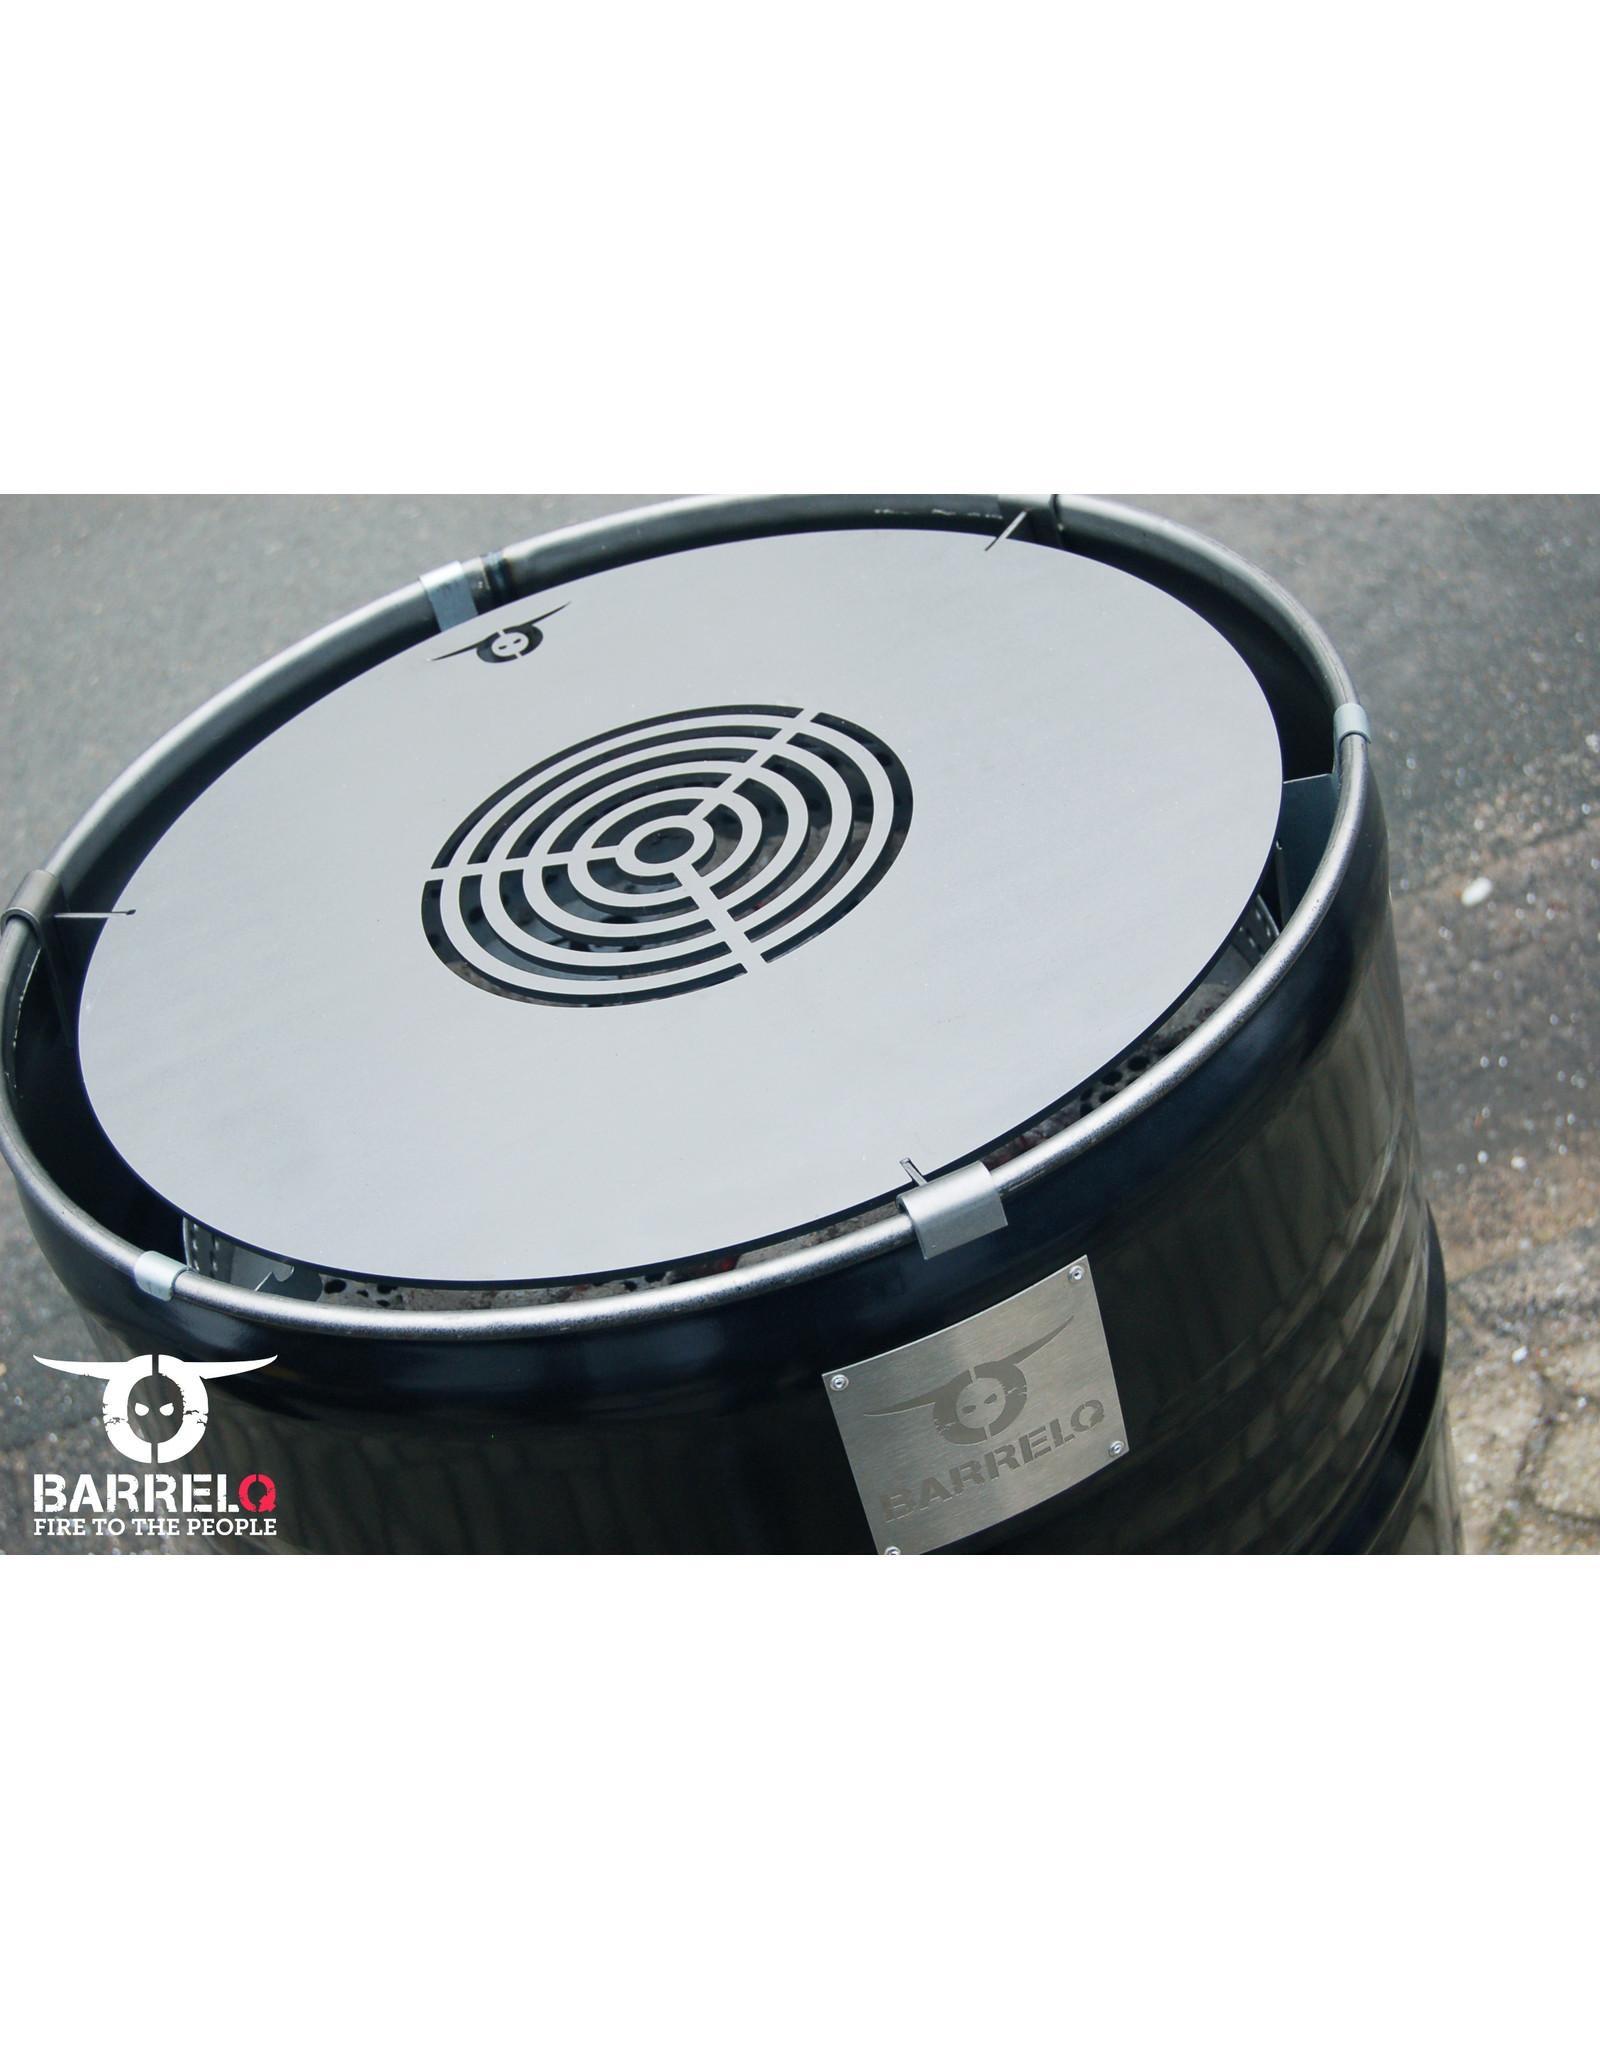 BarrelQ  Teppanyaki Grillplatte  für den BarrelQ Big grill